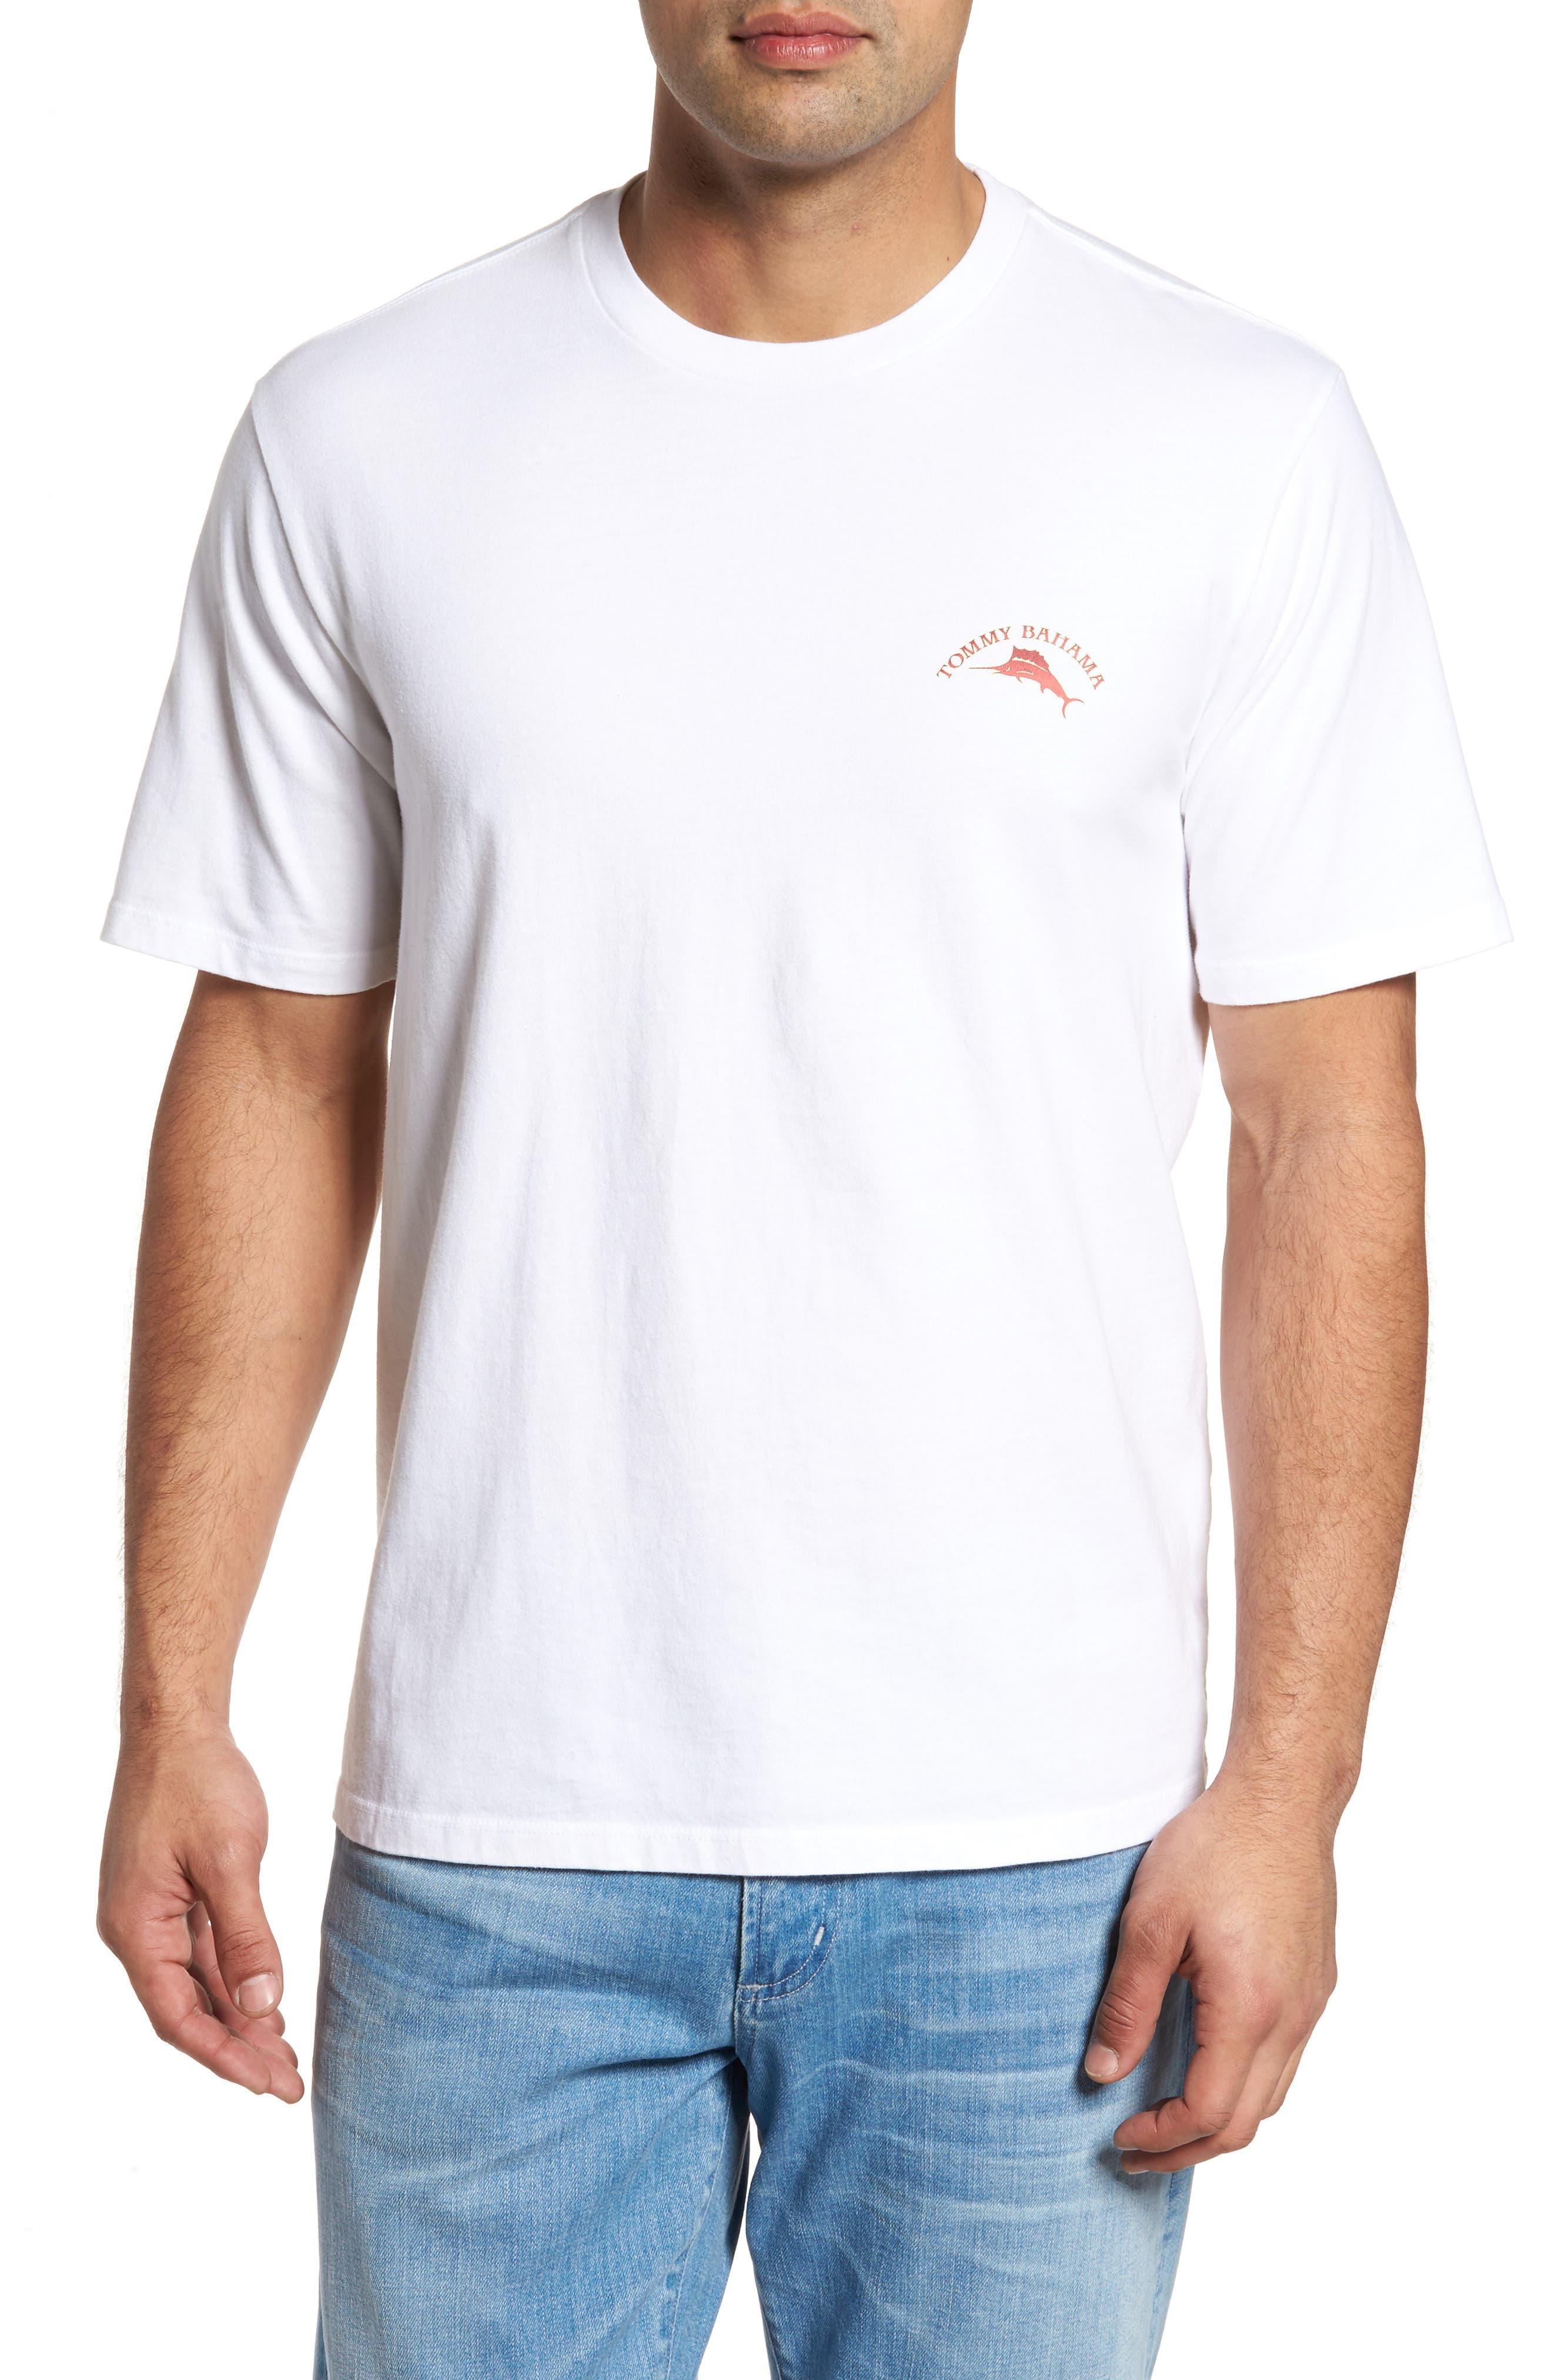 Zinspiration Graphic T-Shirt,                             Main thumbnail 1, color,                             White